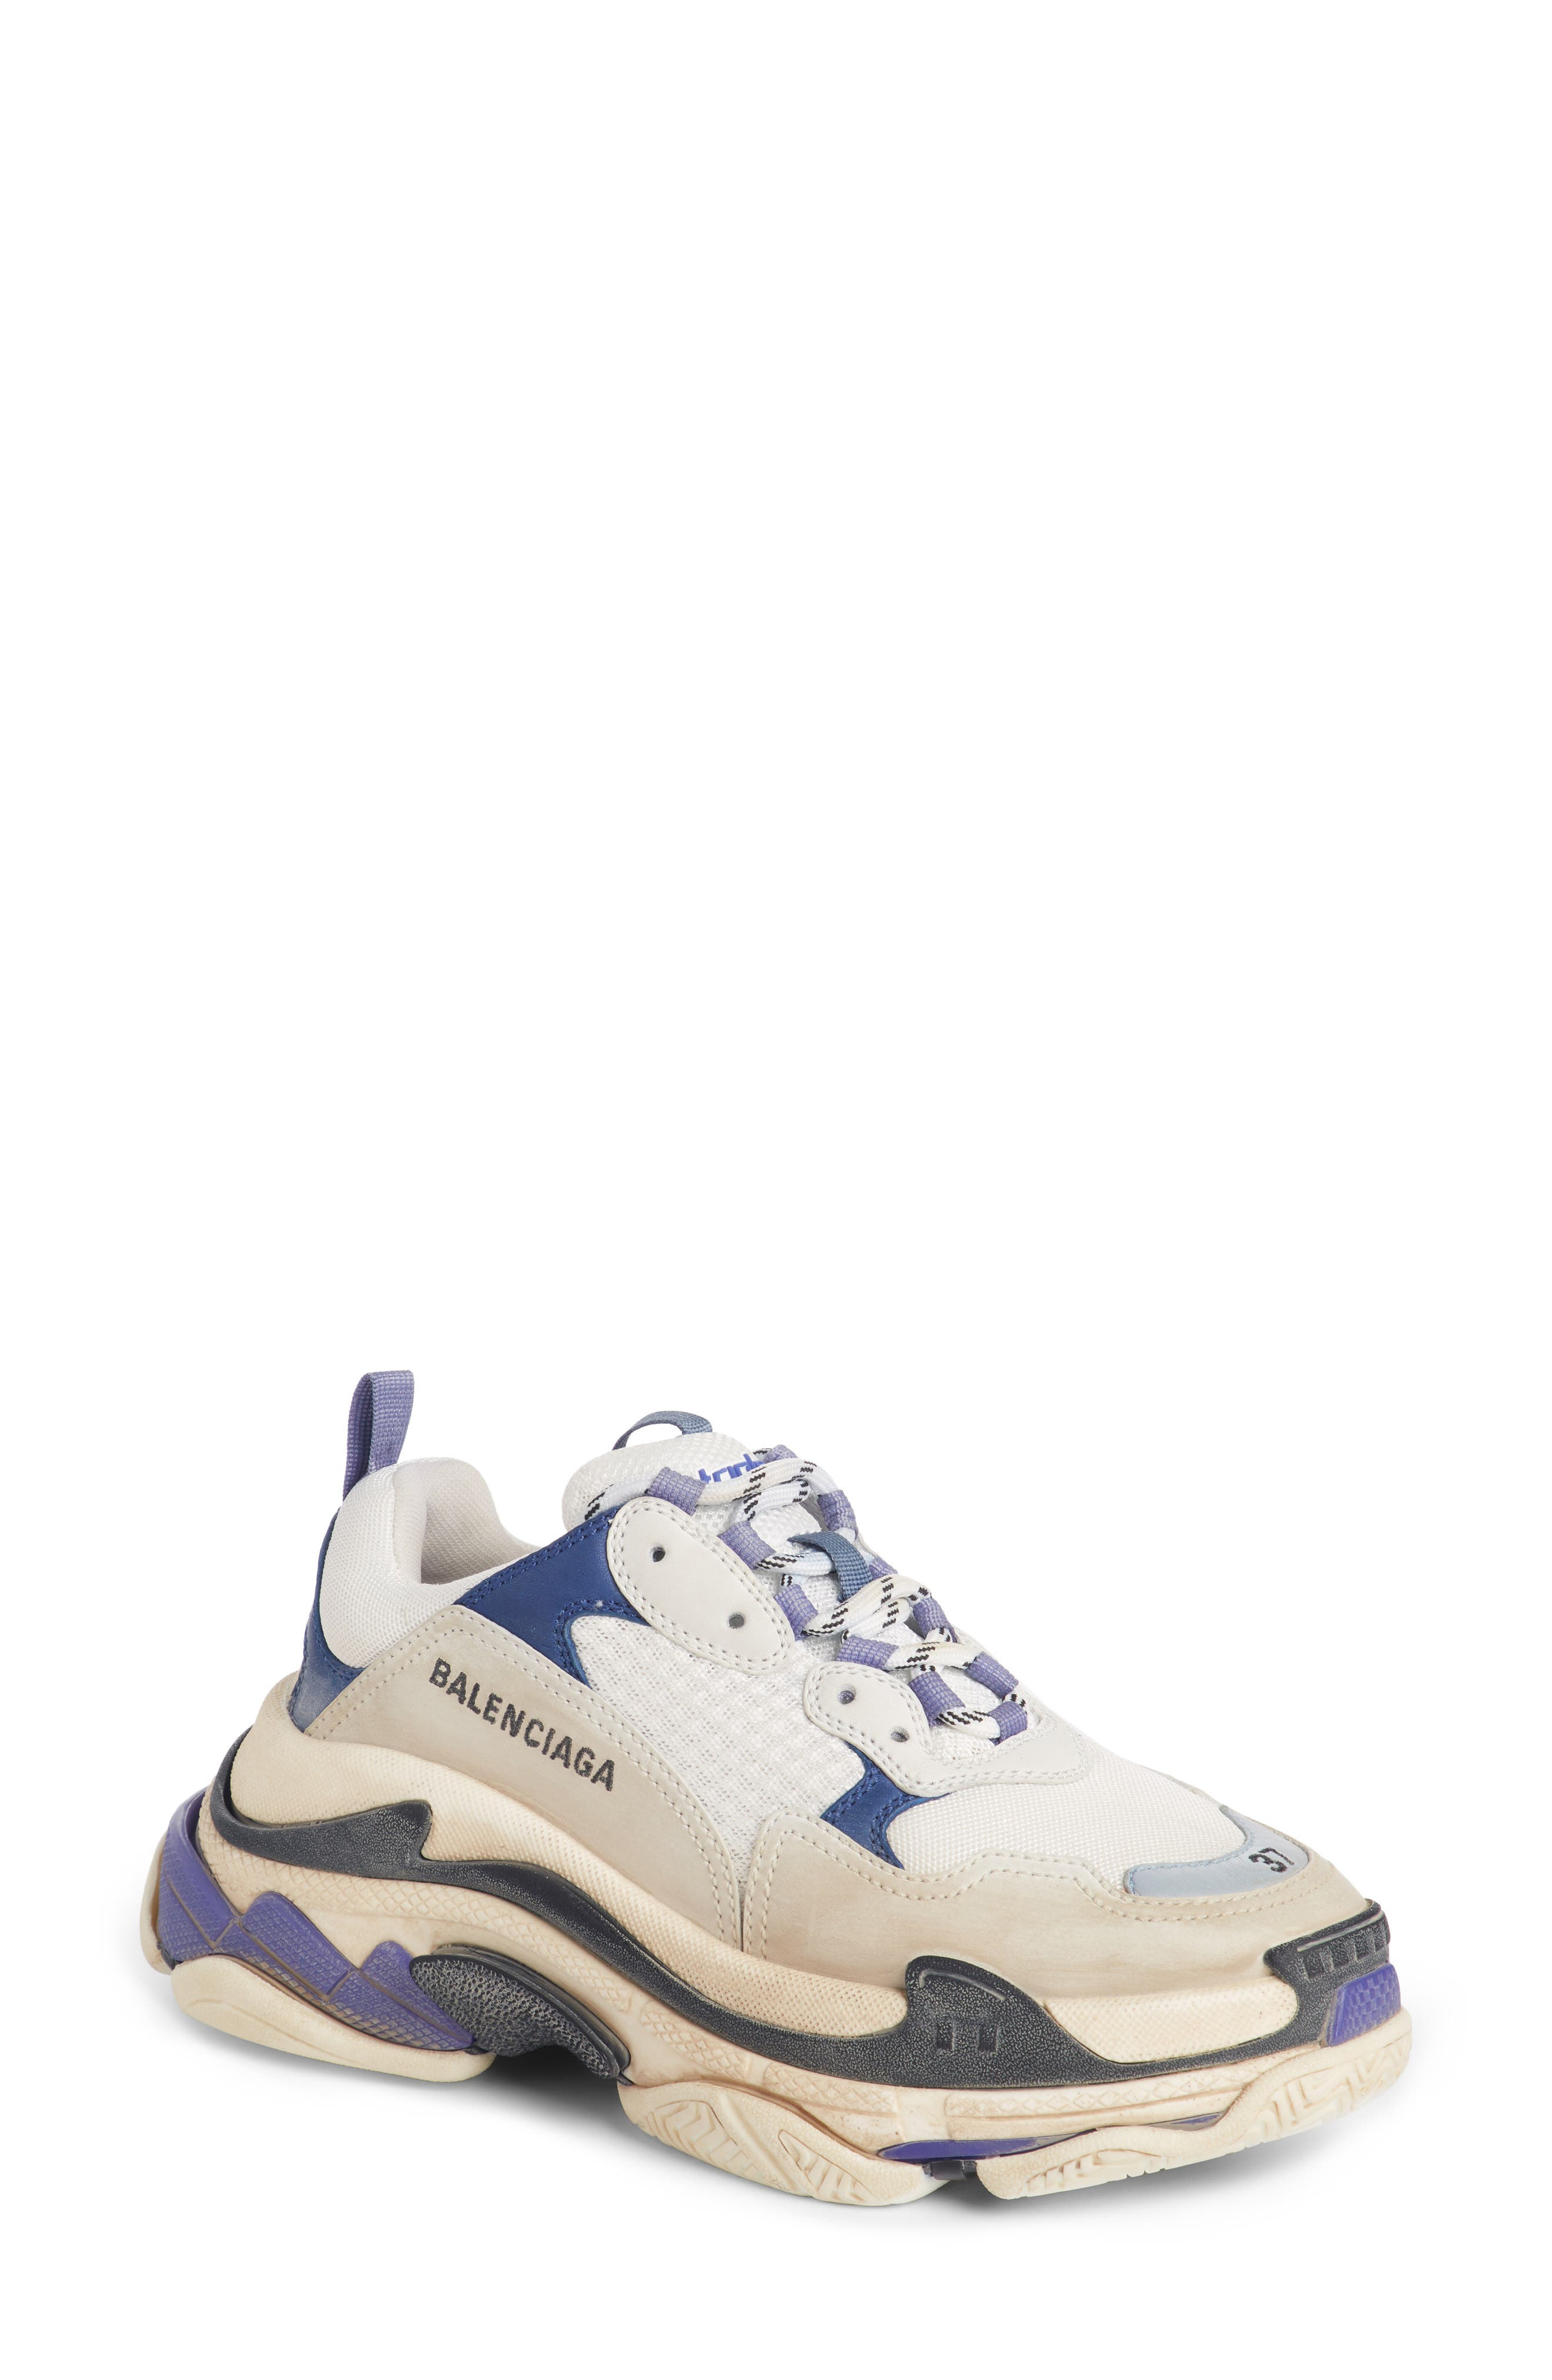 Triple S Sneaker,                             Main thumbnail 1, color,                             VIOLET/ WHITE/ BLUE